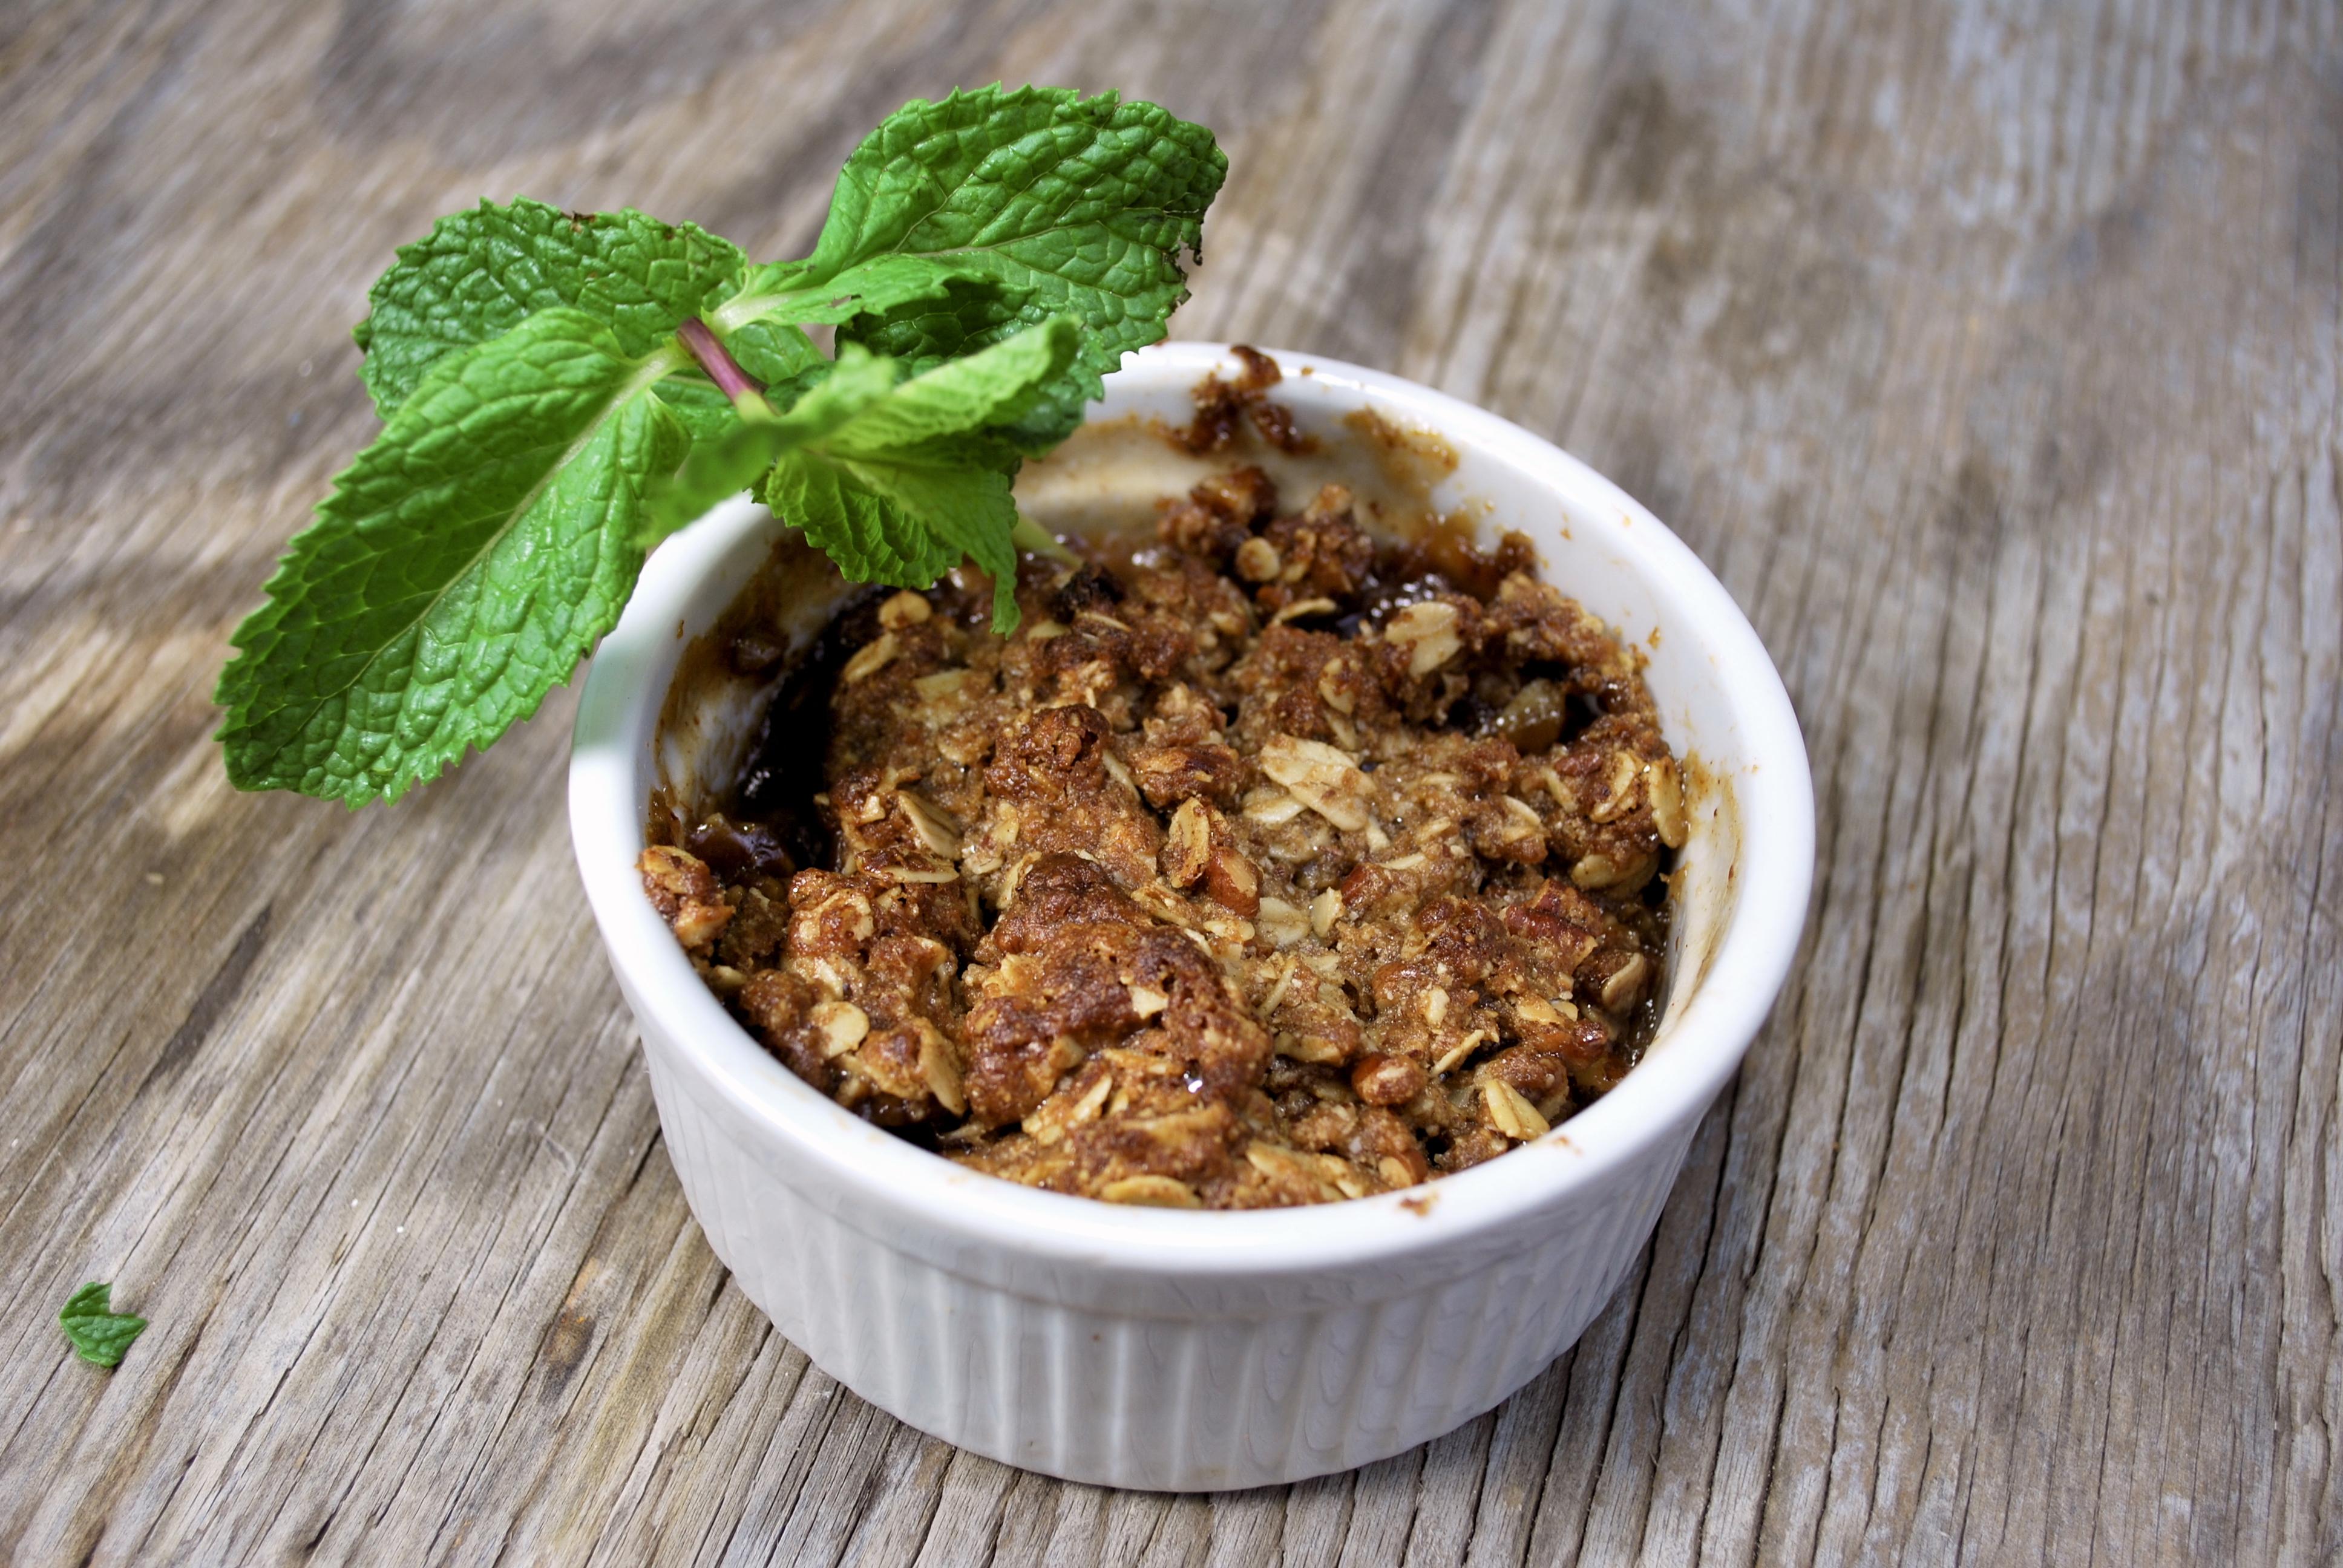 spiralizing recipes - desserts - gluten-free apple crisp